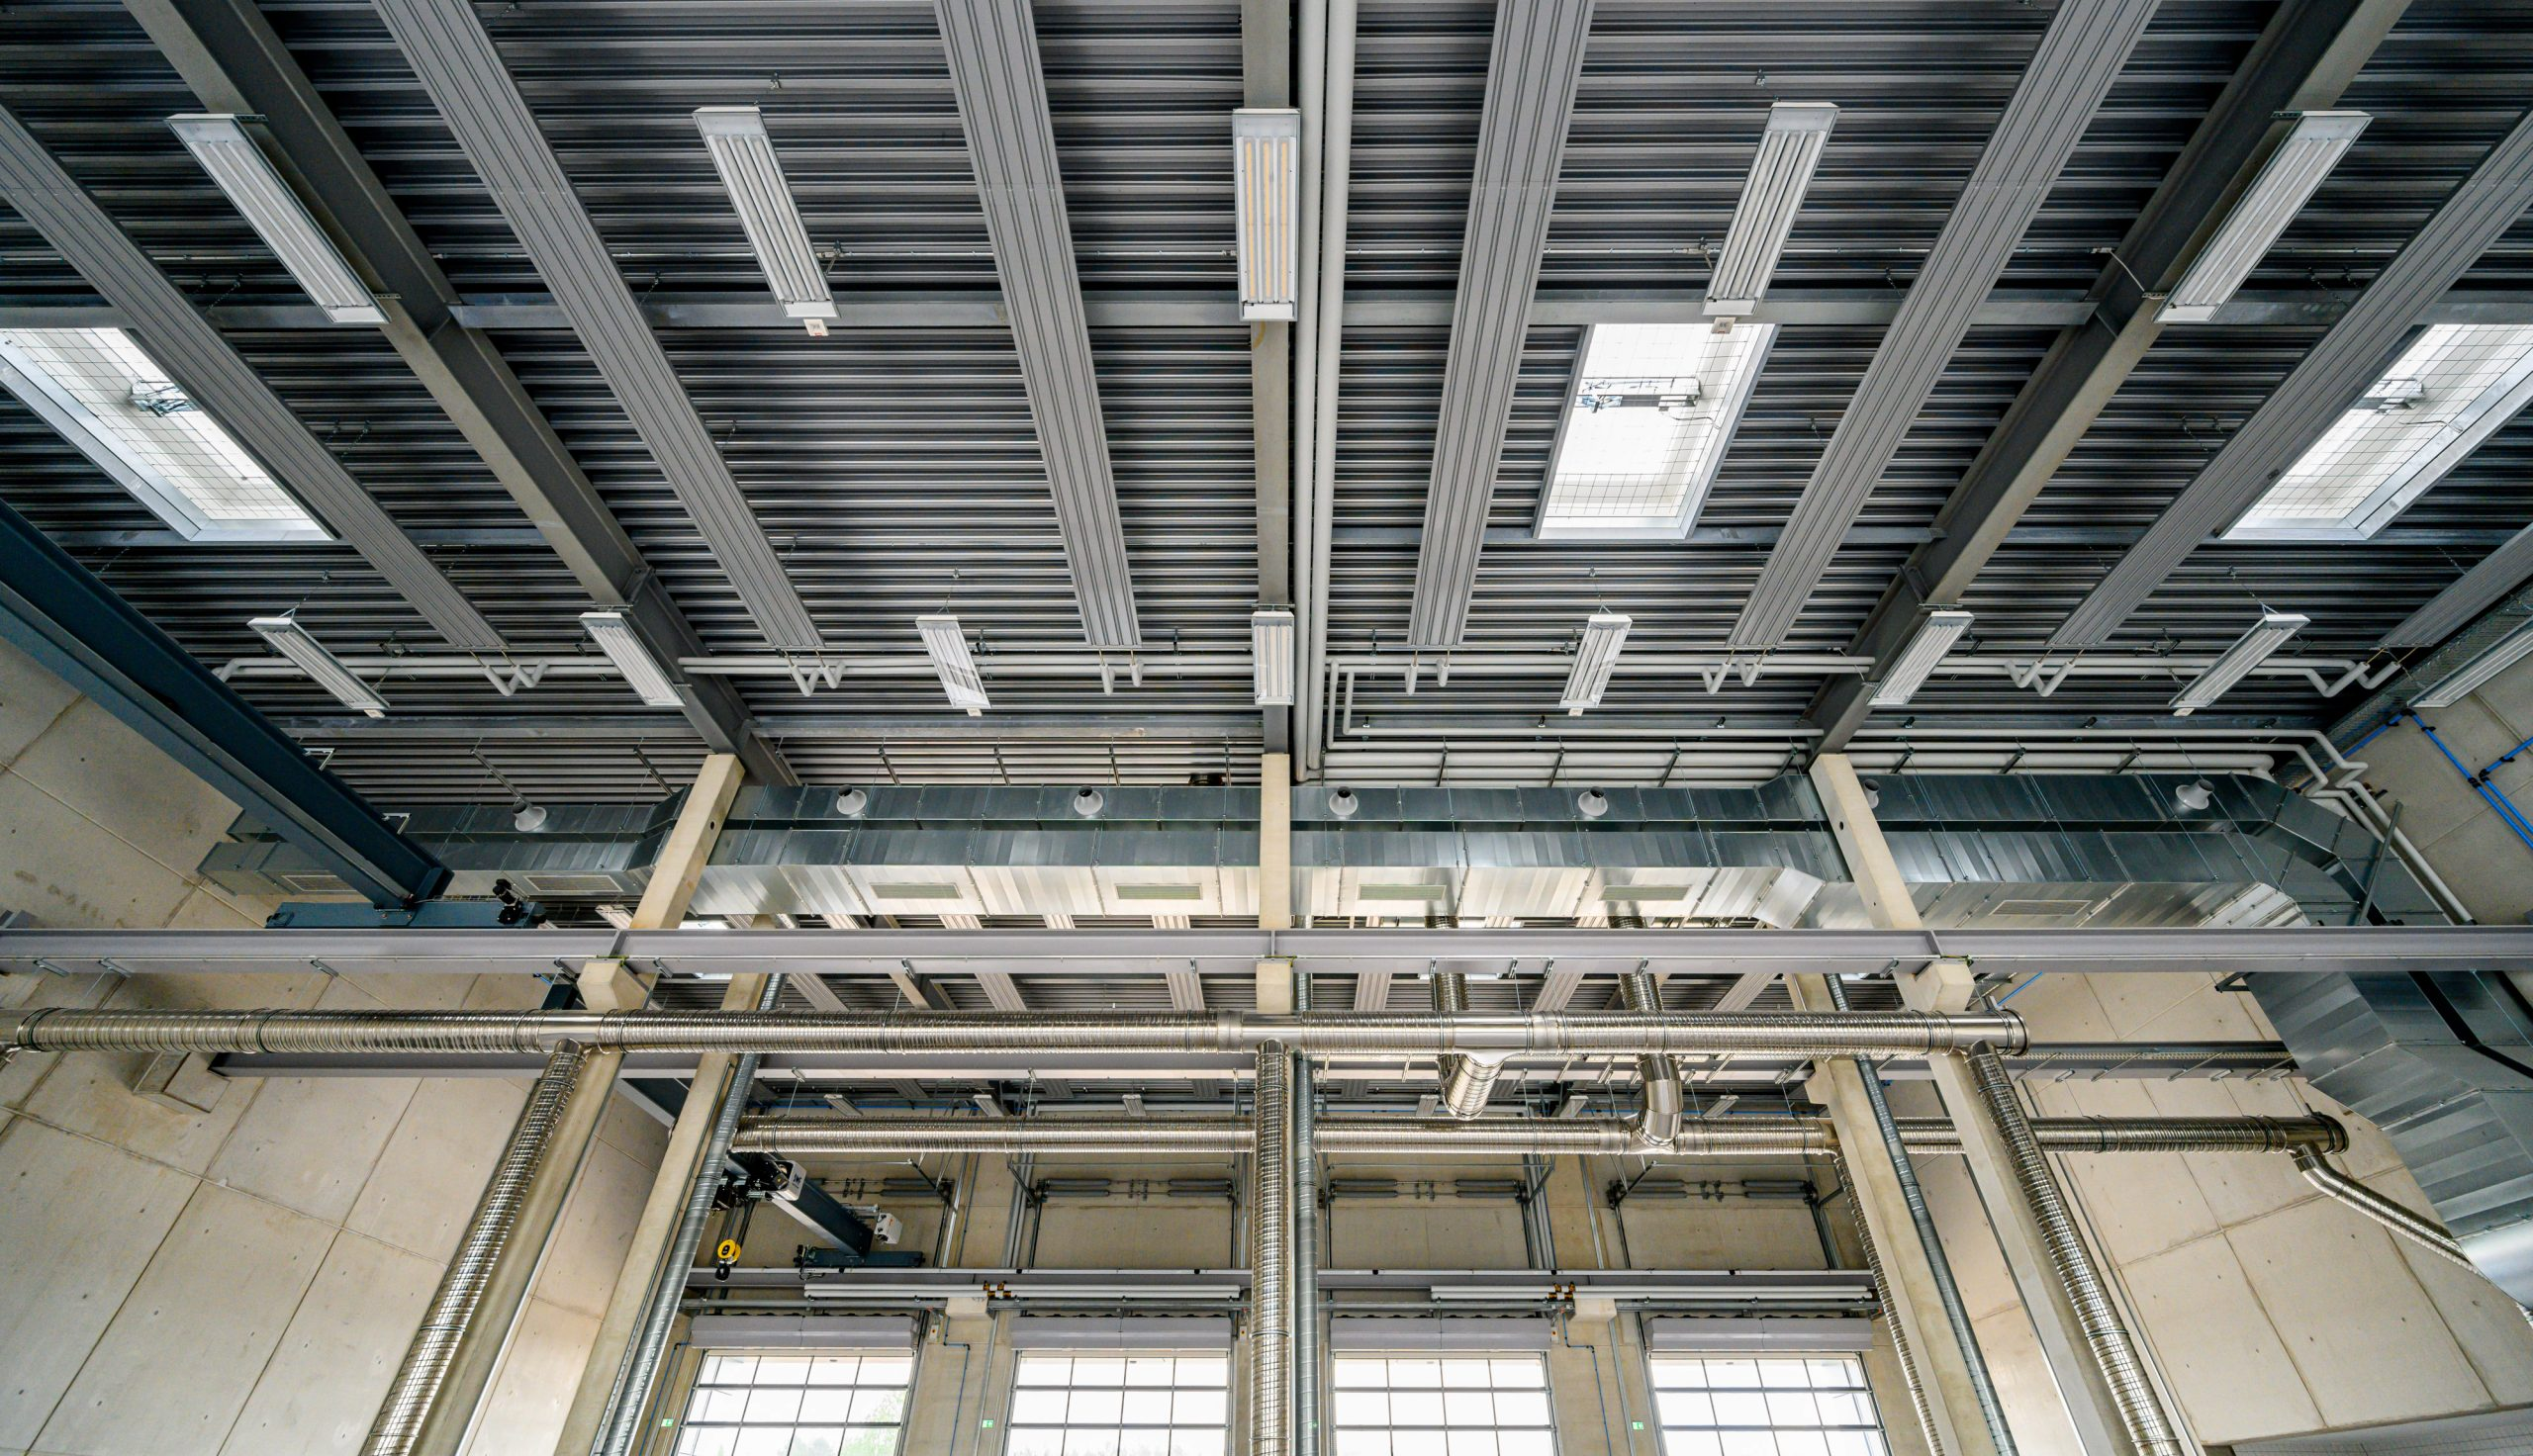 Projektbild 12, Kfz Instandsetzungshalle |  |  H.-J. Zieten Kaserne Beelitz